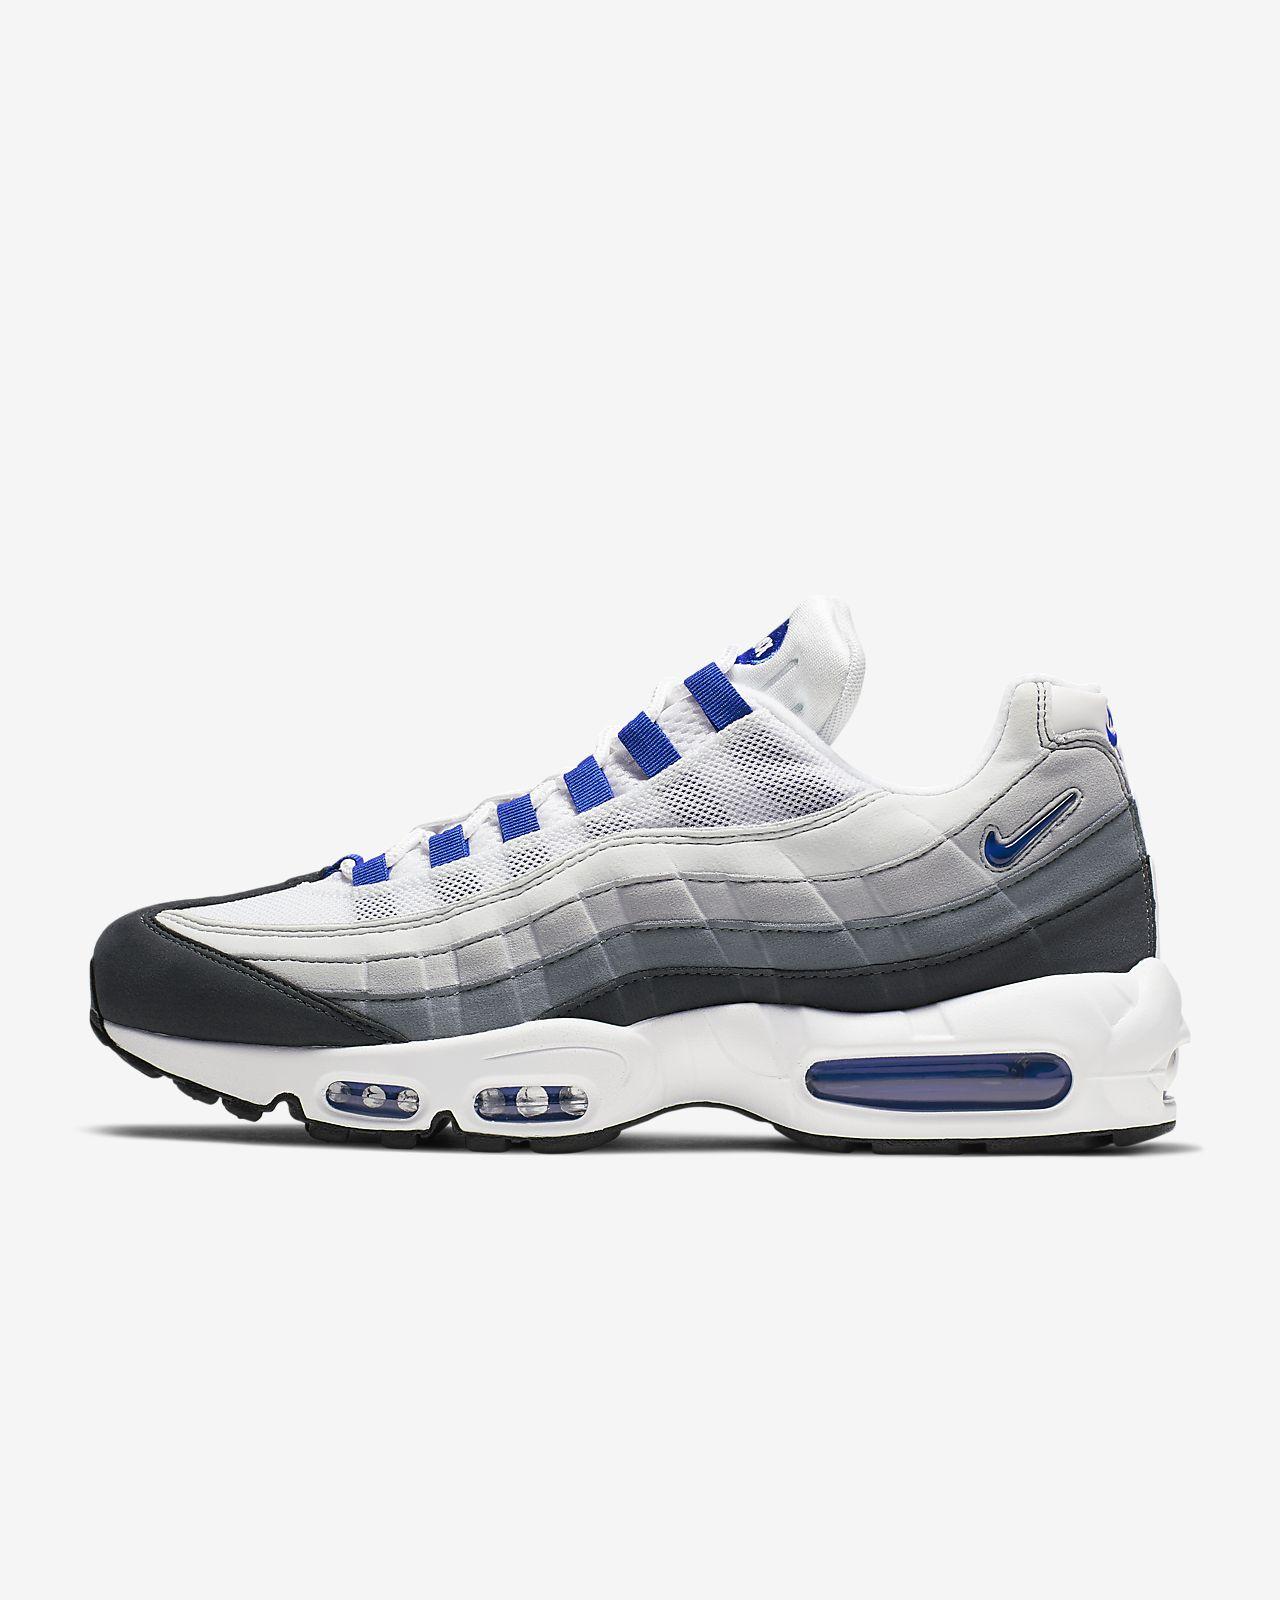 Chaussure Nike Air Max 95 SC pour Homme